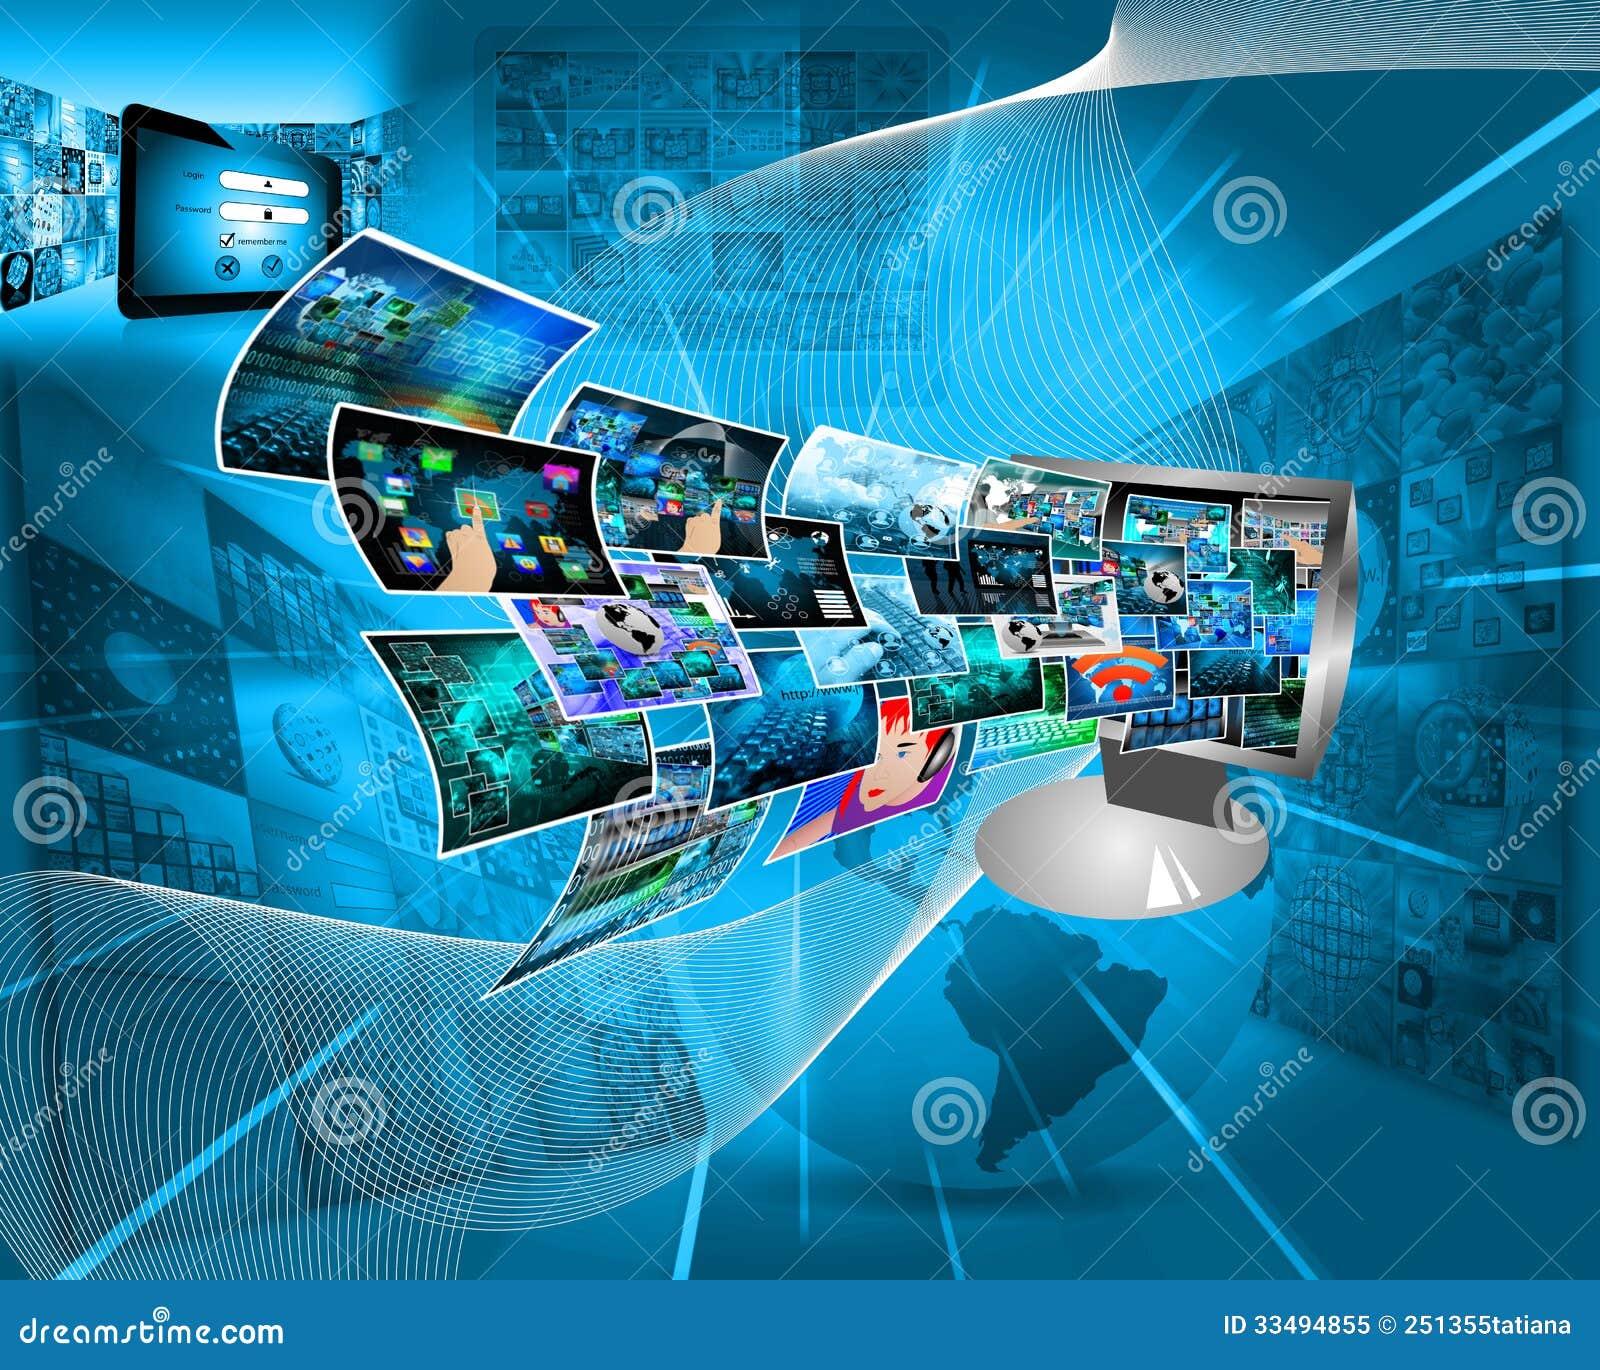 Download computer themes 3d videoschistosos.us